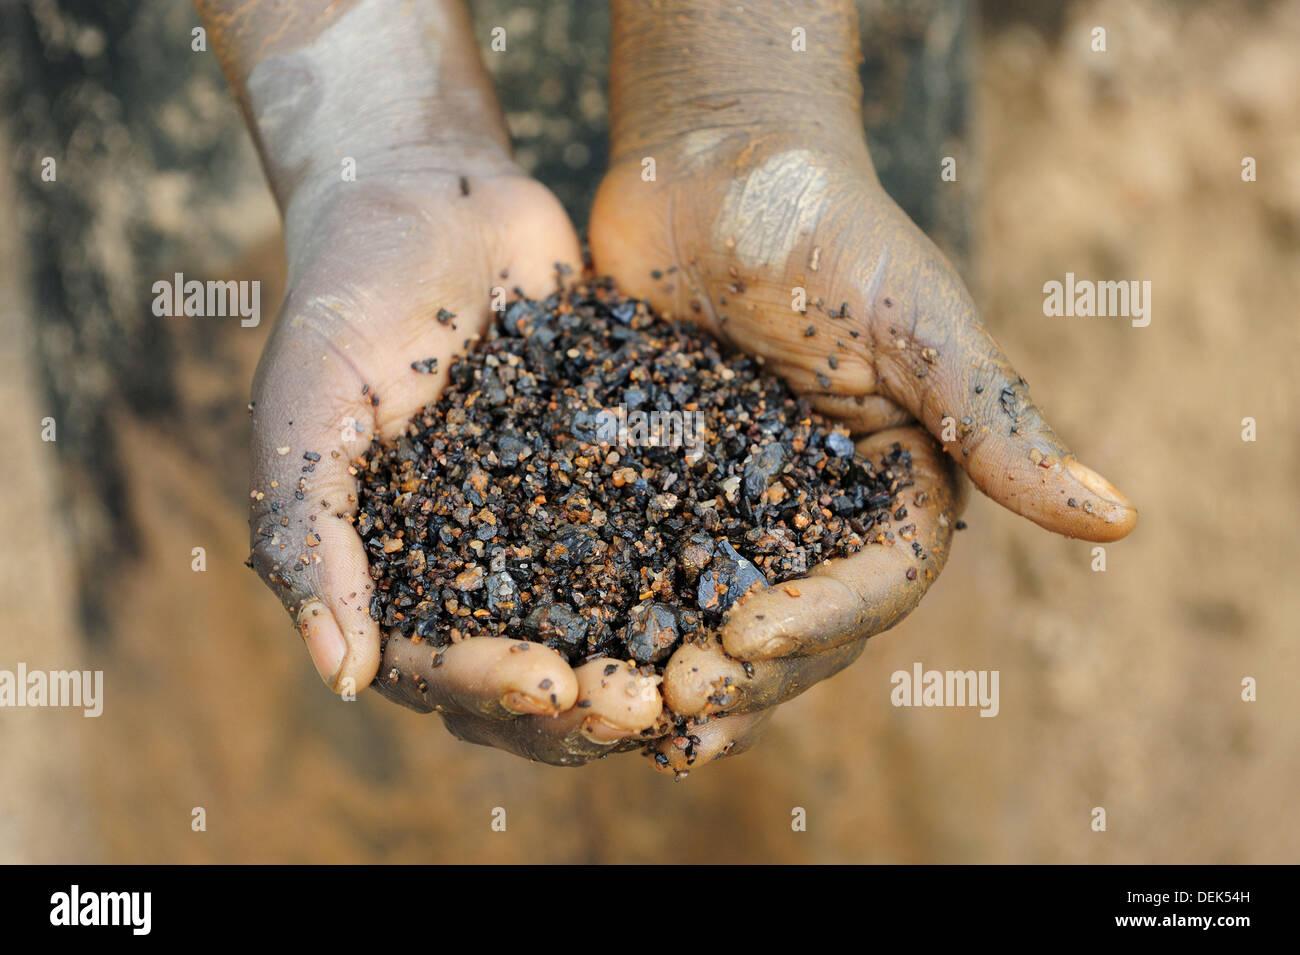 Miner with hands full of coltan metallic ore, Muhanga coltan mines, Rwanda, Africa - Stock Image